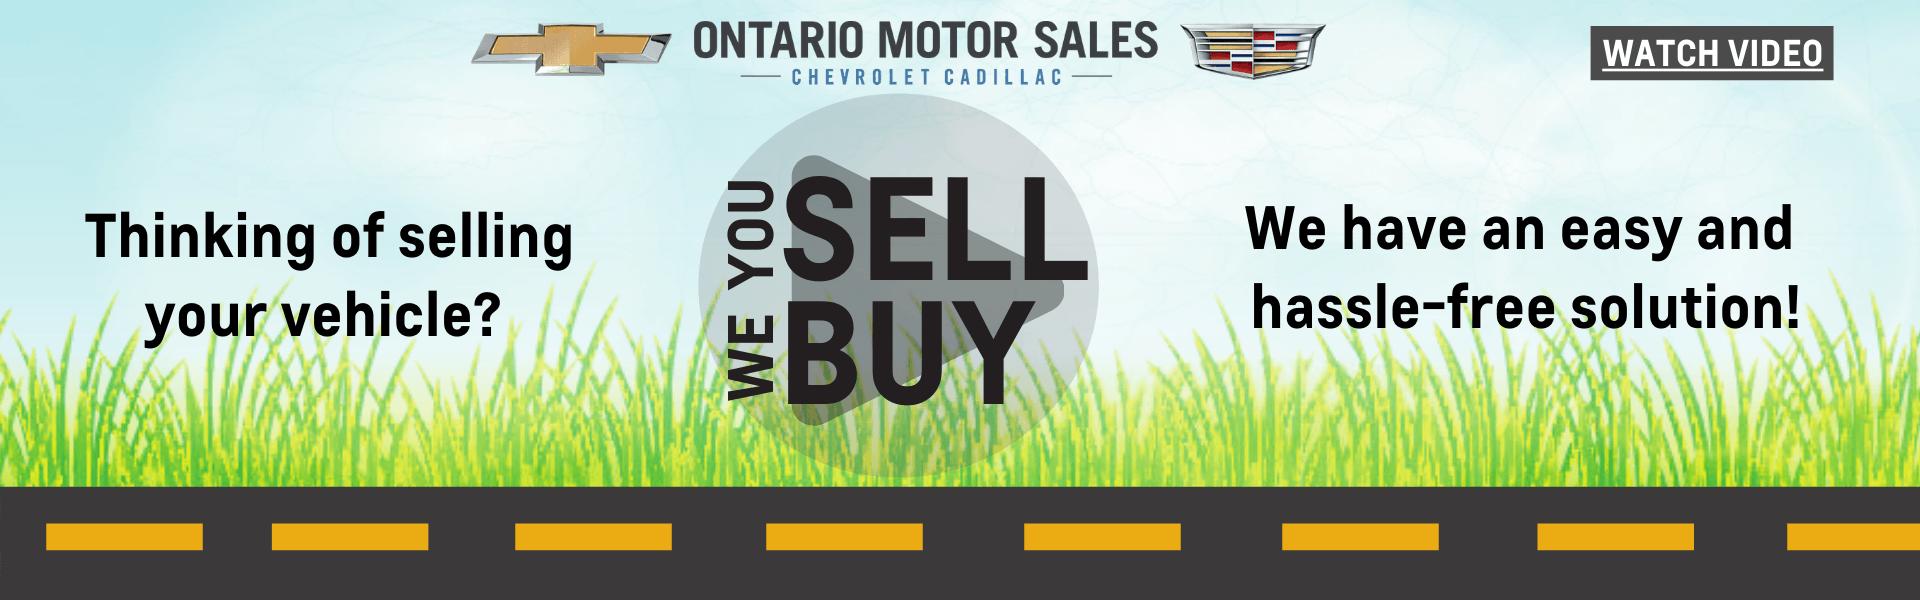 How to sell vehicle Oshawa